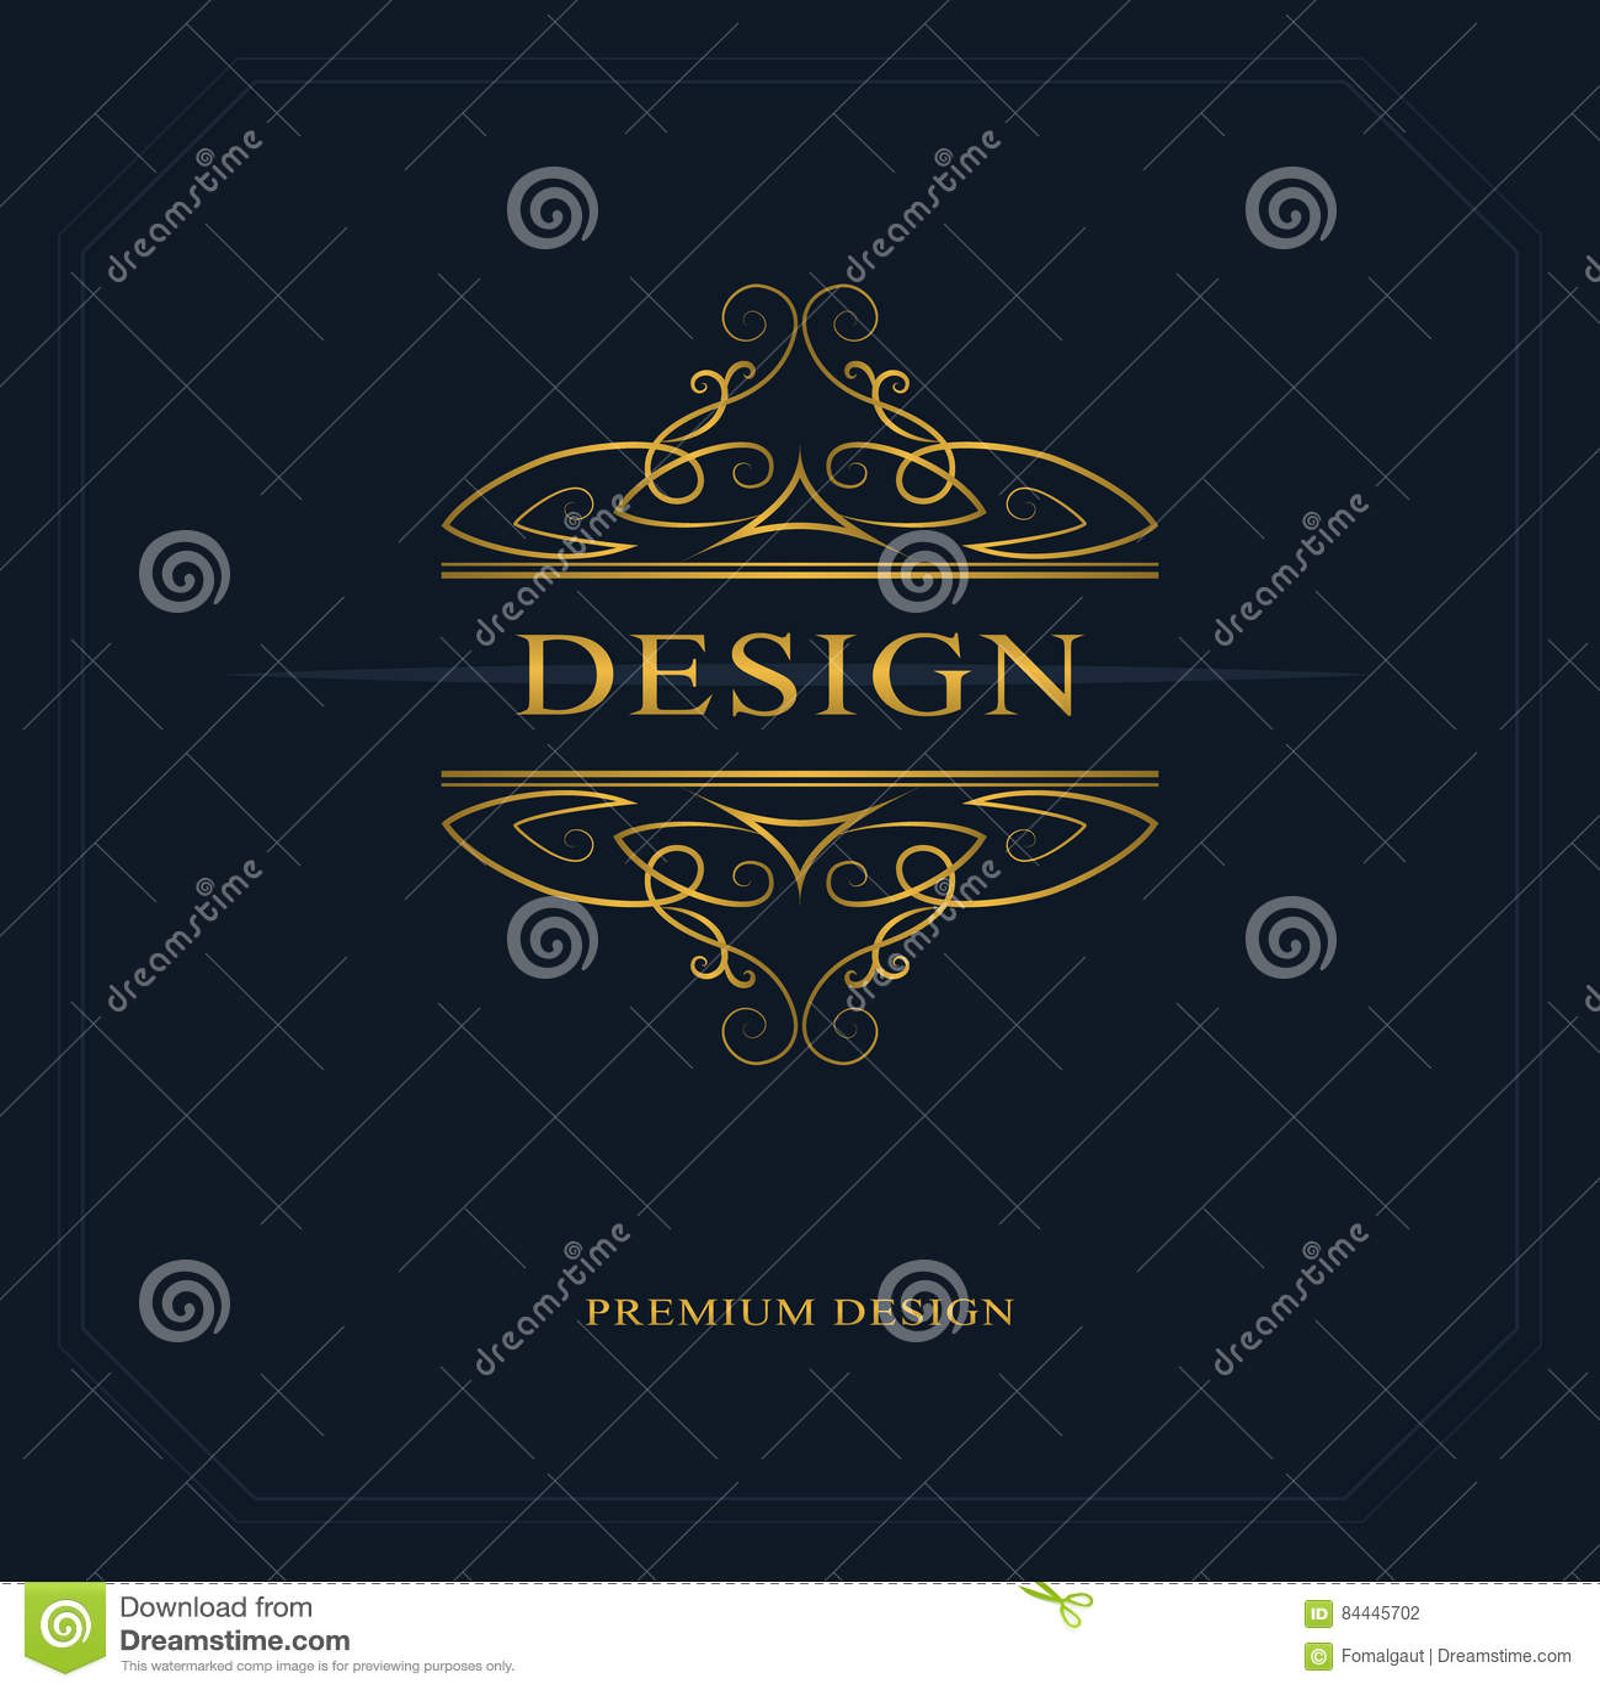 Line Art Logo Design : Monogram design elements graceful template calligraphic